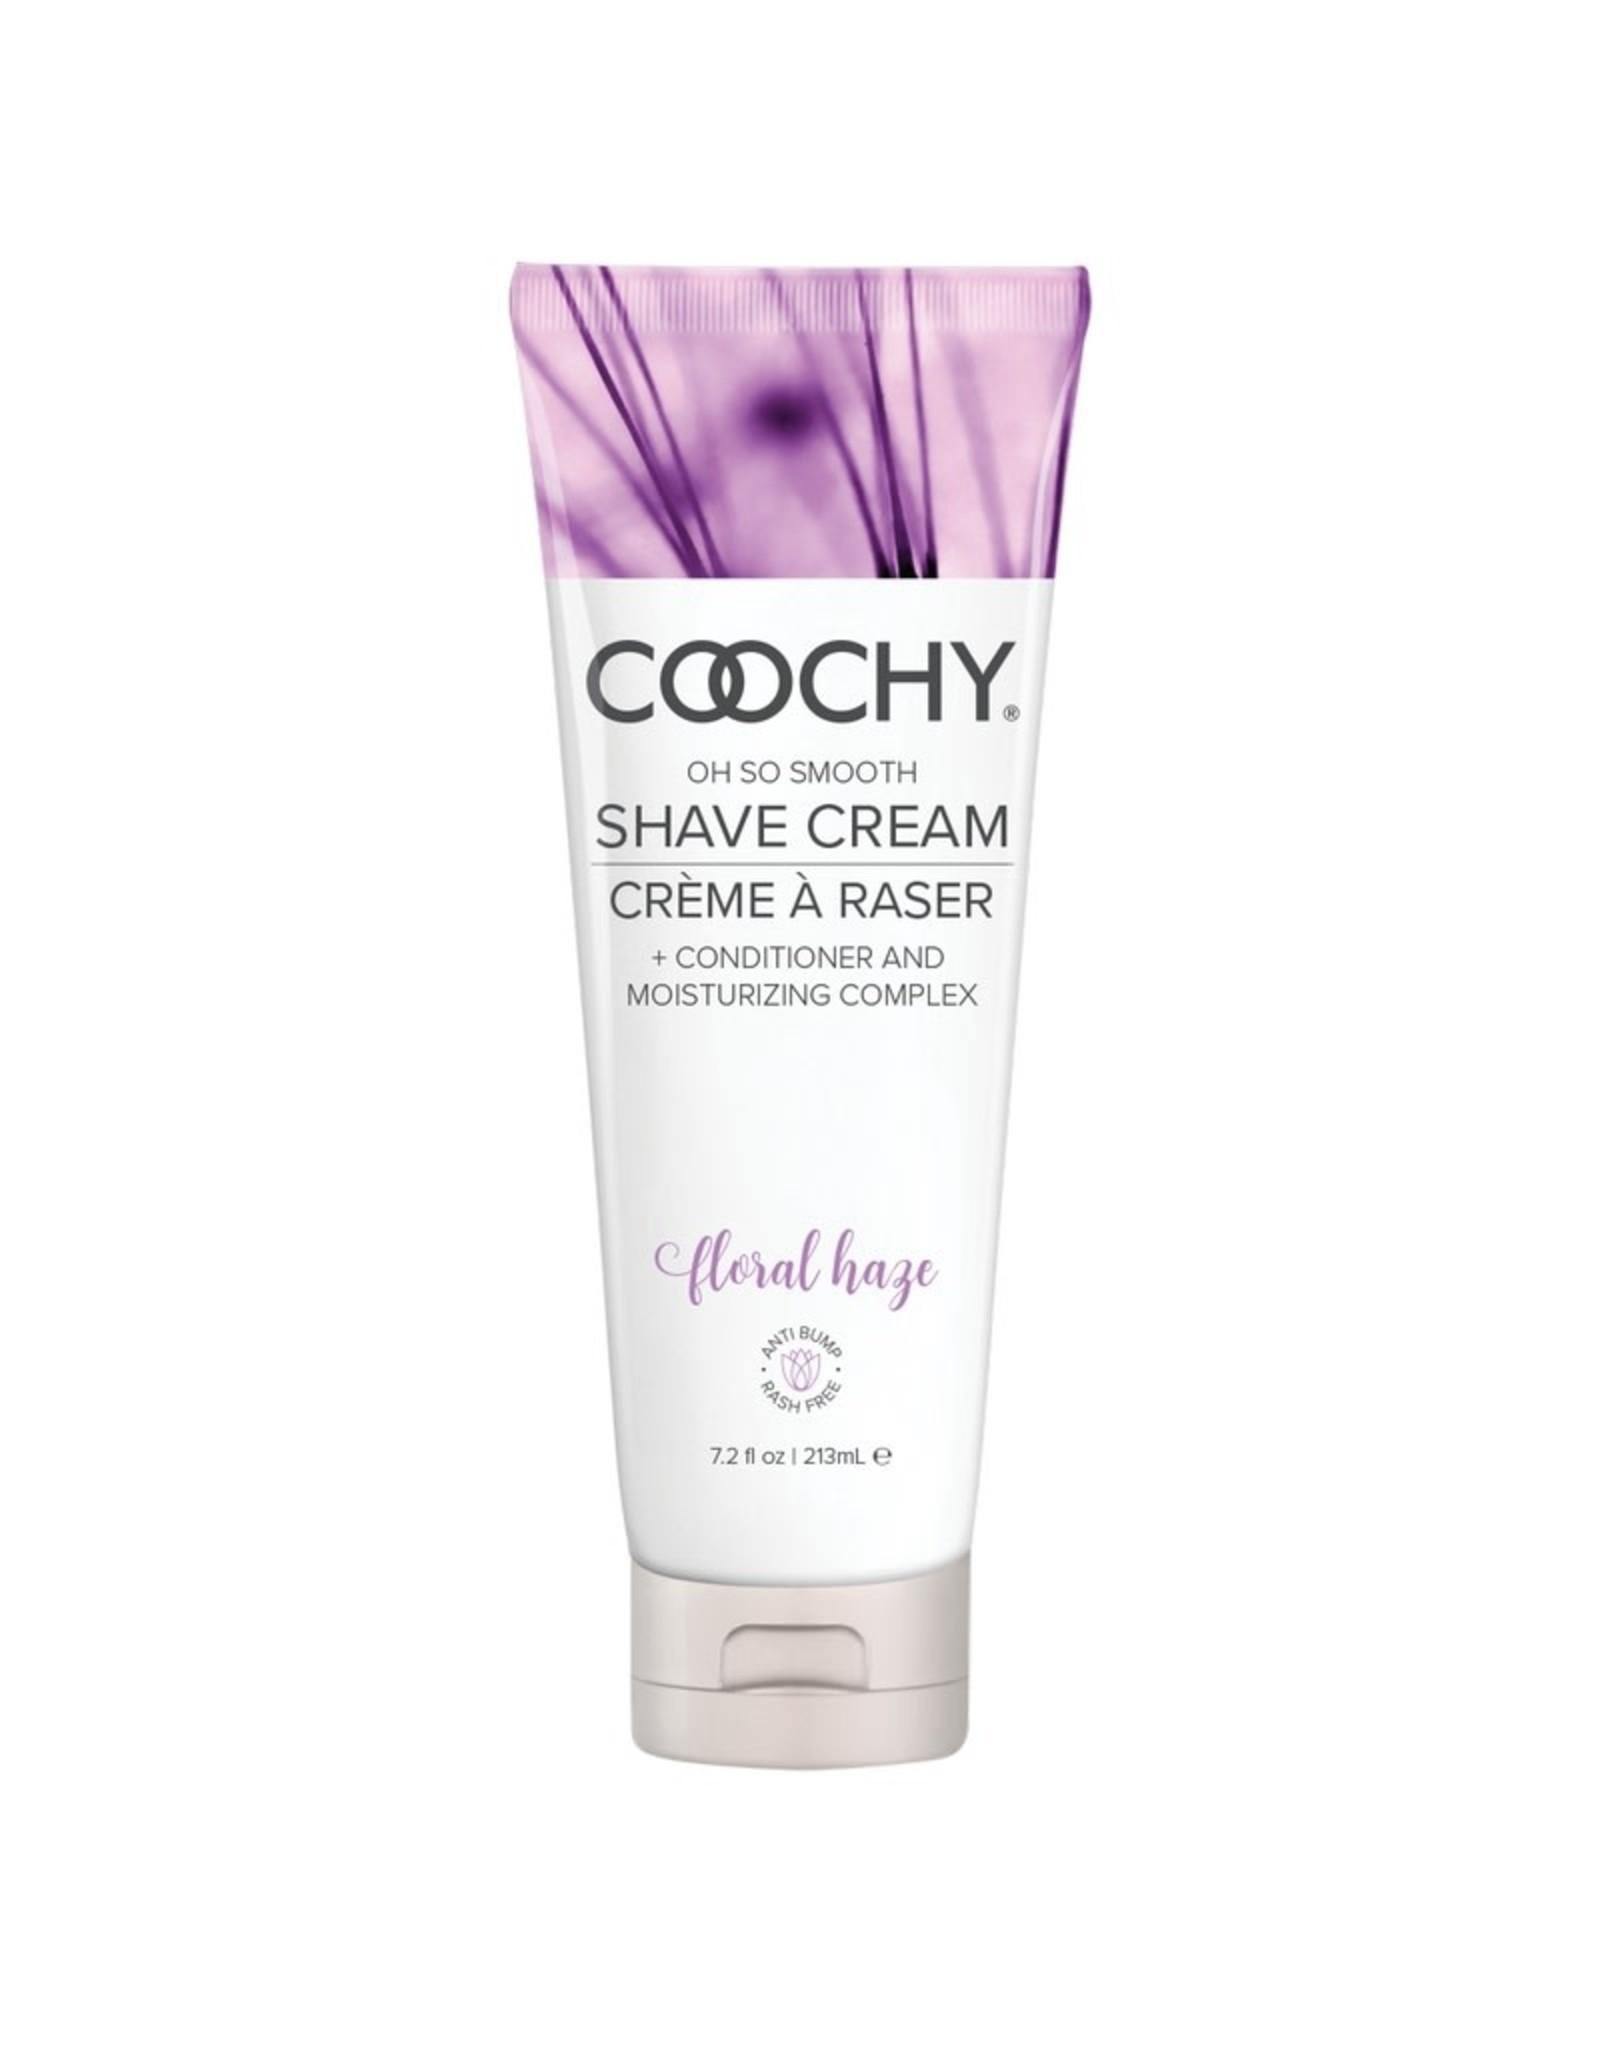 Classic Brands Coochy - Floral Haze - 7.2 oz